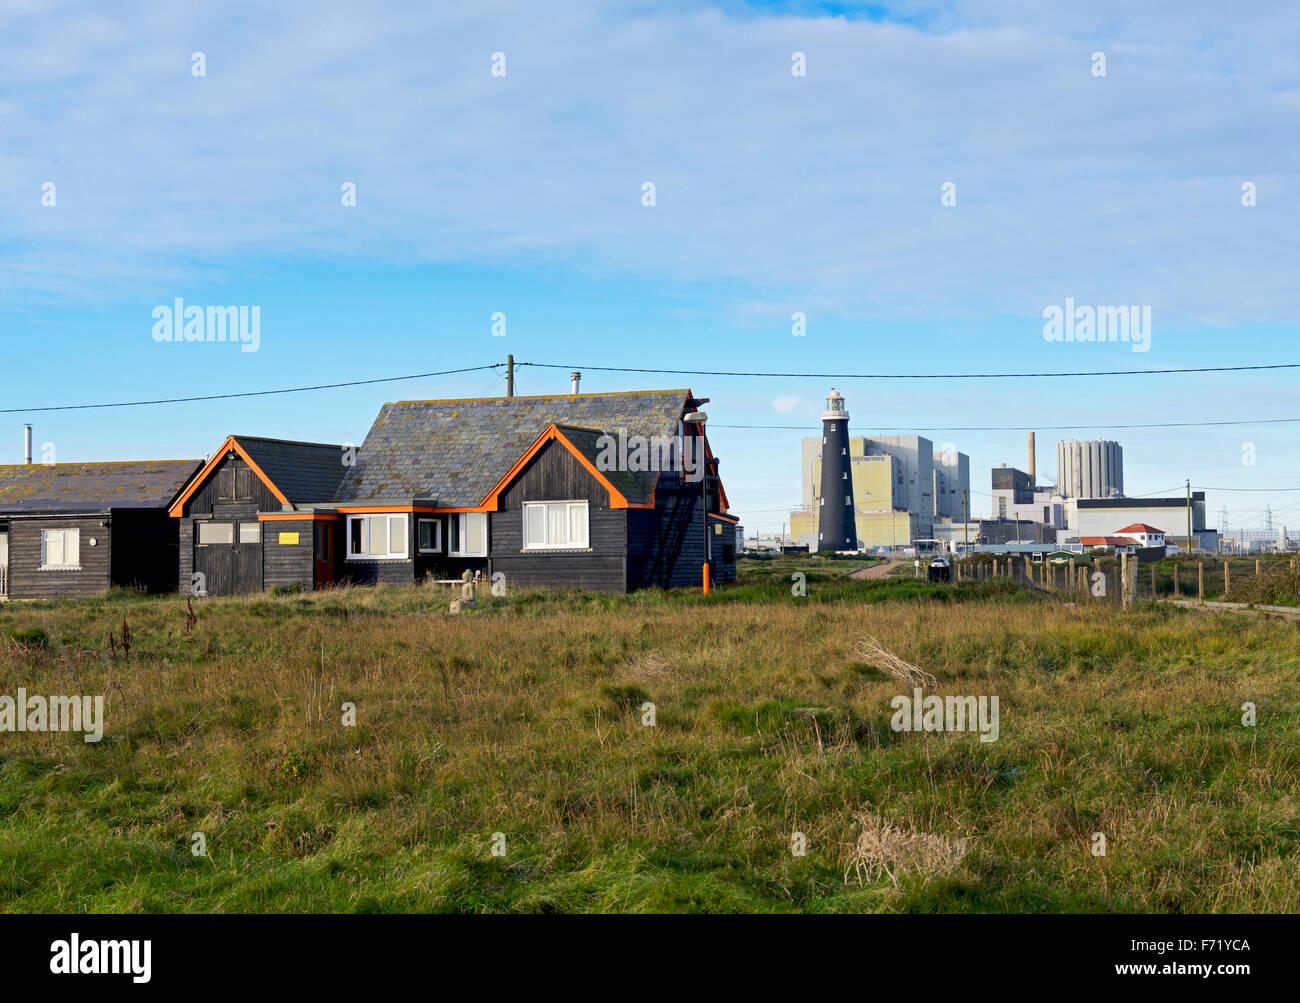 Hölzerne Hütte und Nuclear Power Station, Dungeness, Kent, England UK Stockbild